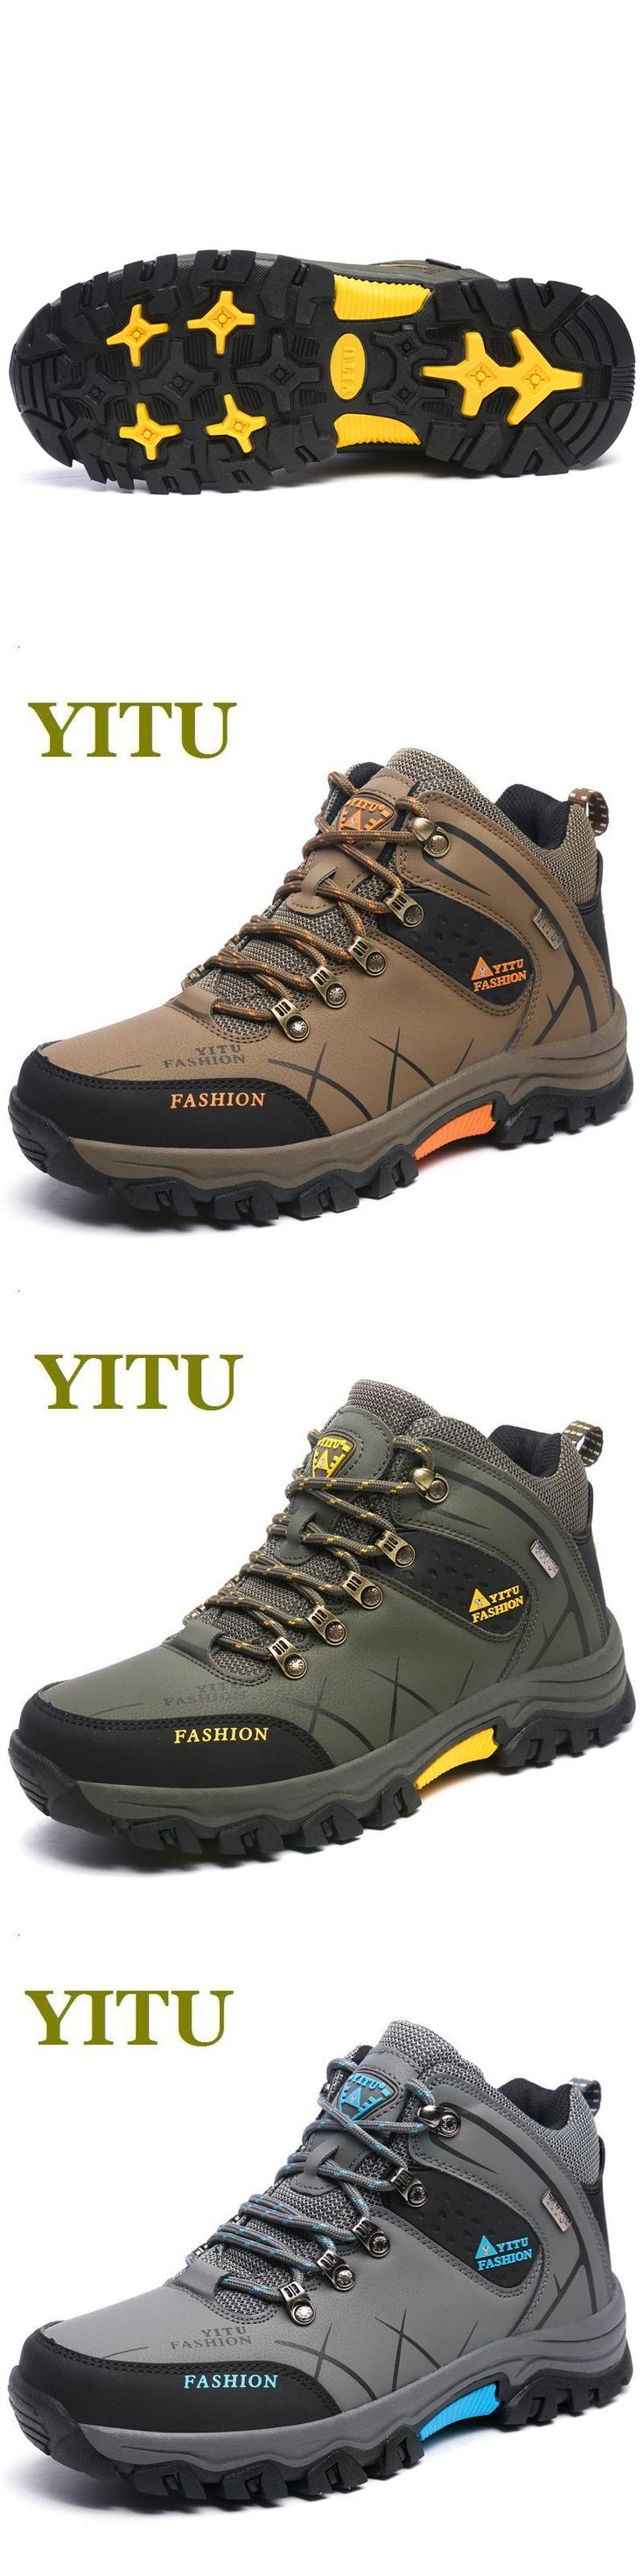 Plus size men outdoor hiking boots 2016 autumn winter sneakers warm male trekking shoes waterproof climbing shoes anti-skid